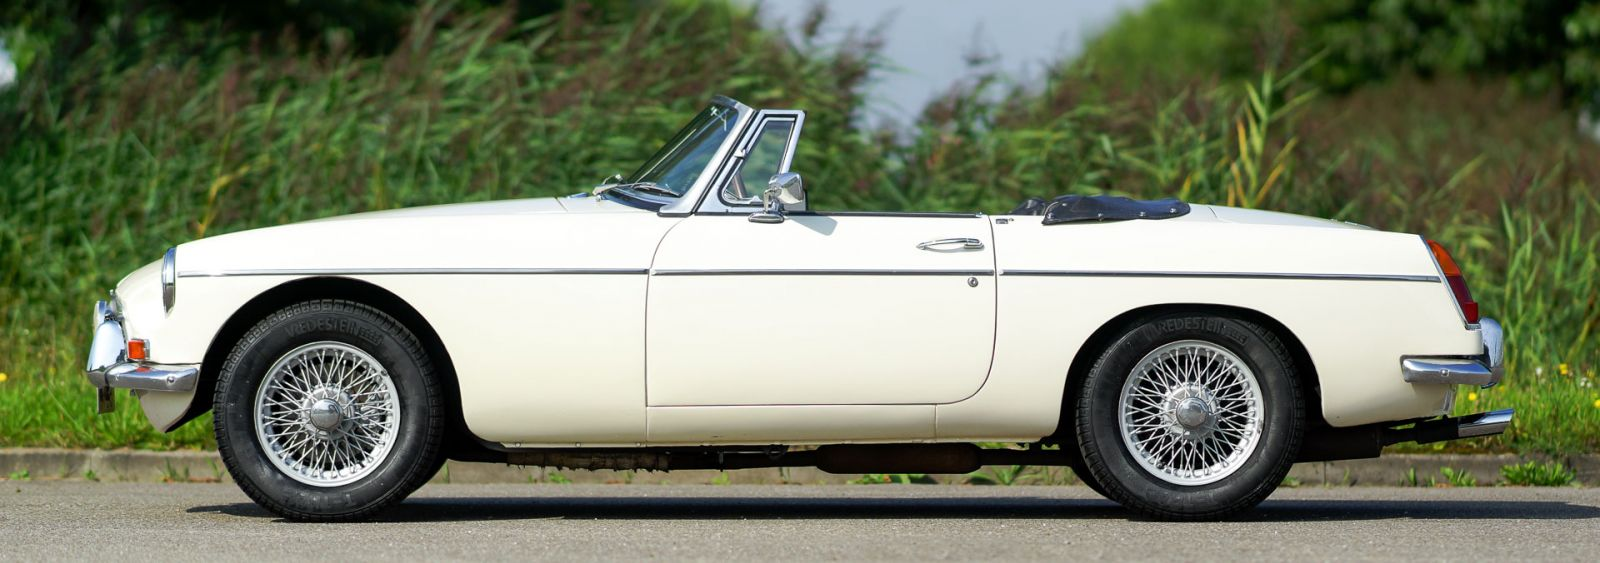 MG MGB roadster, 1967